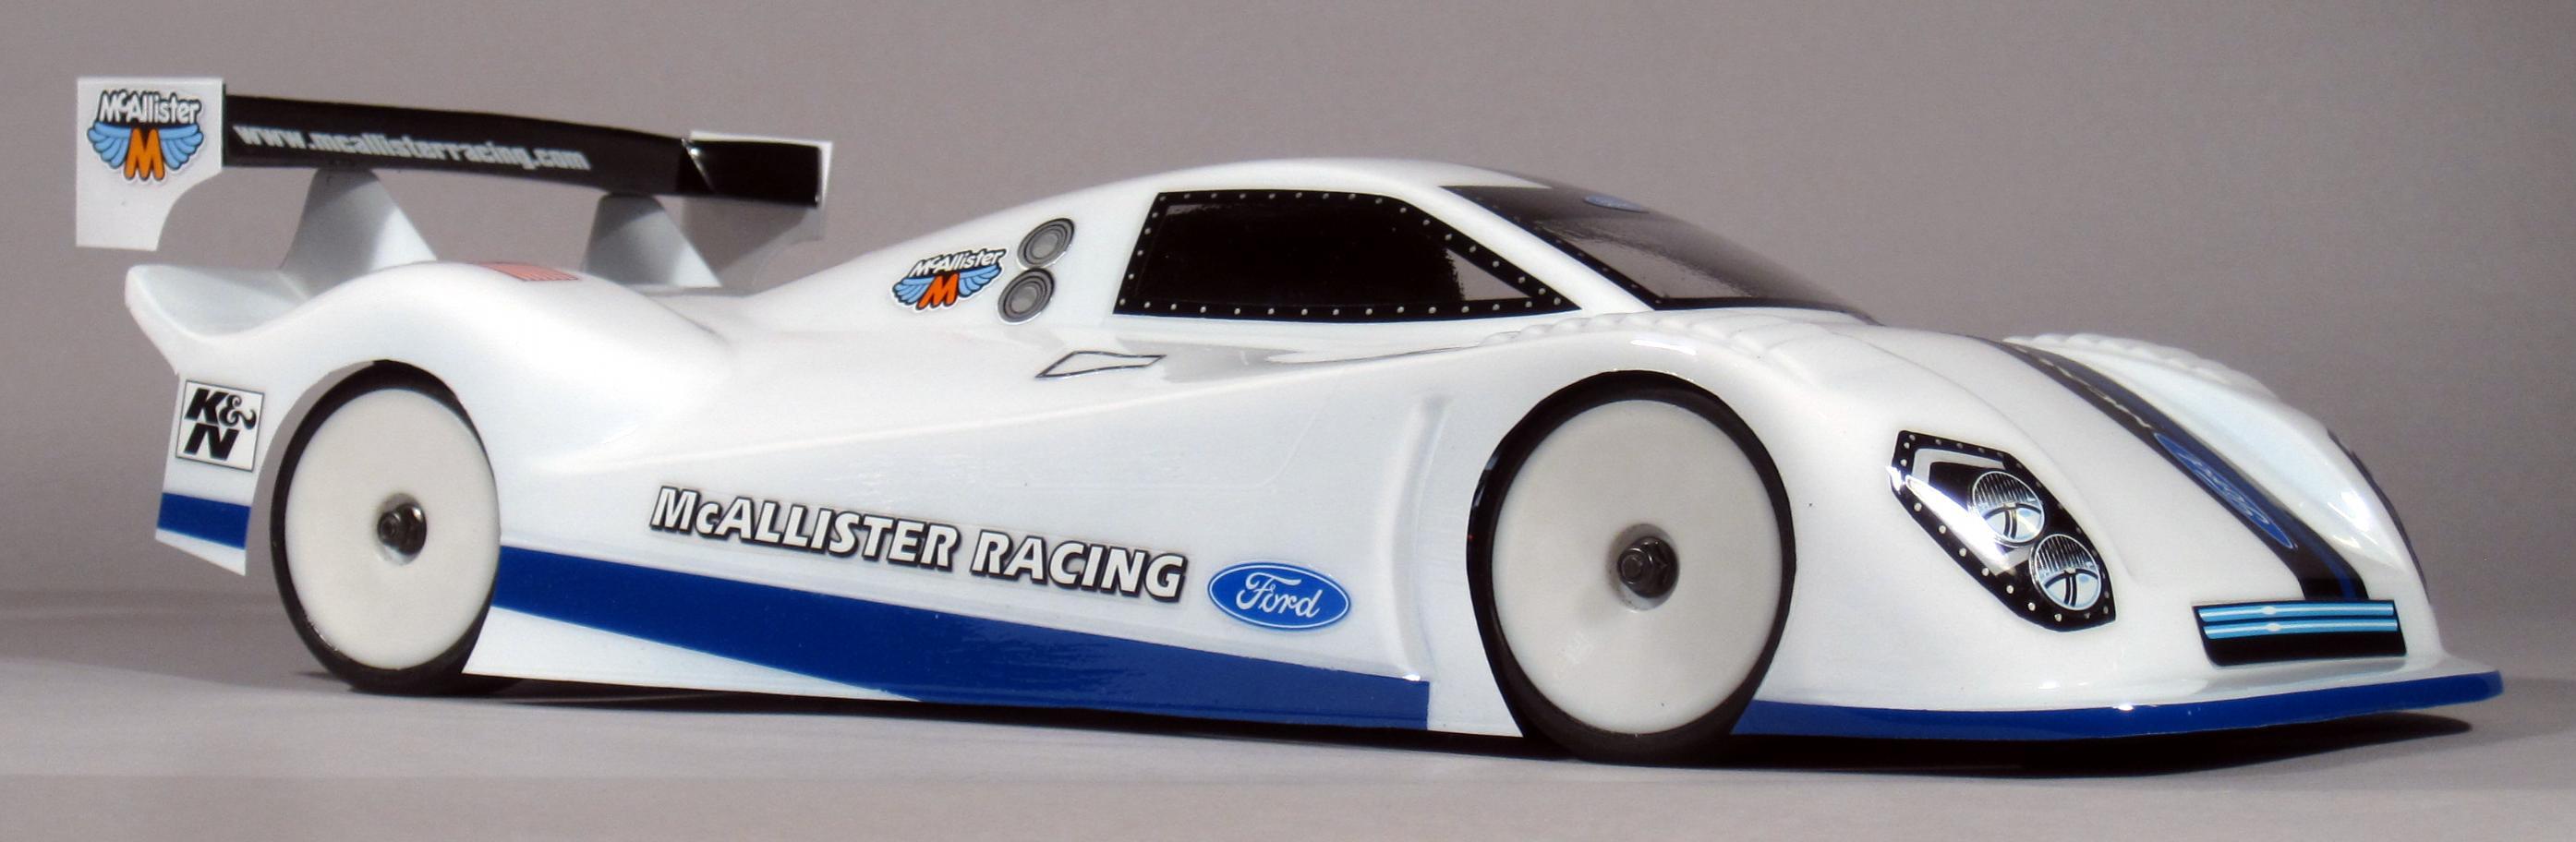 New body release- Daytona Prototype - R/C Tech Forums